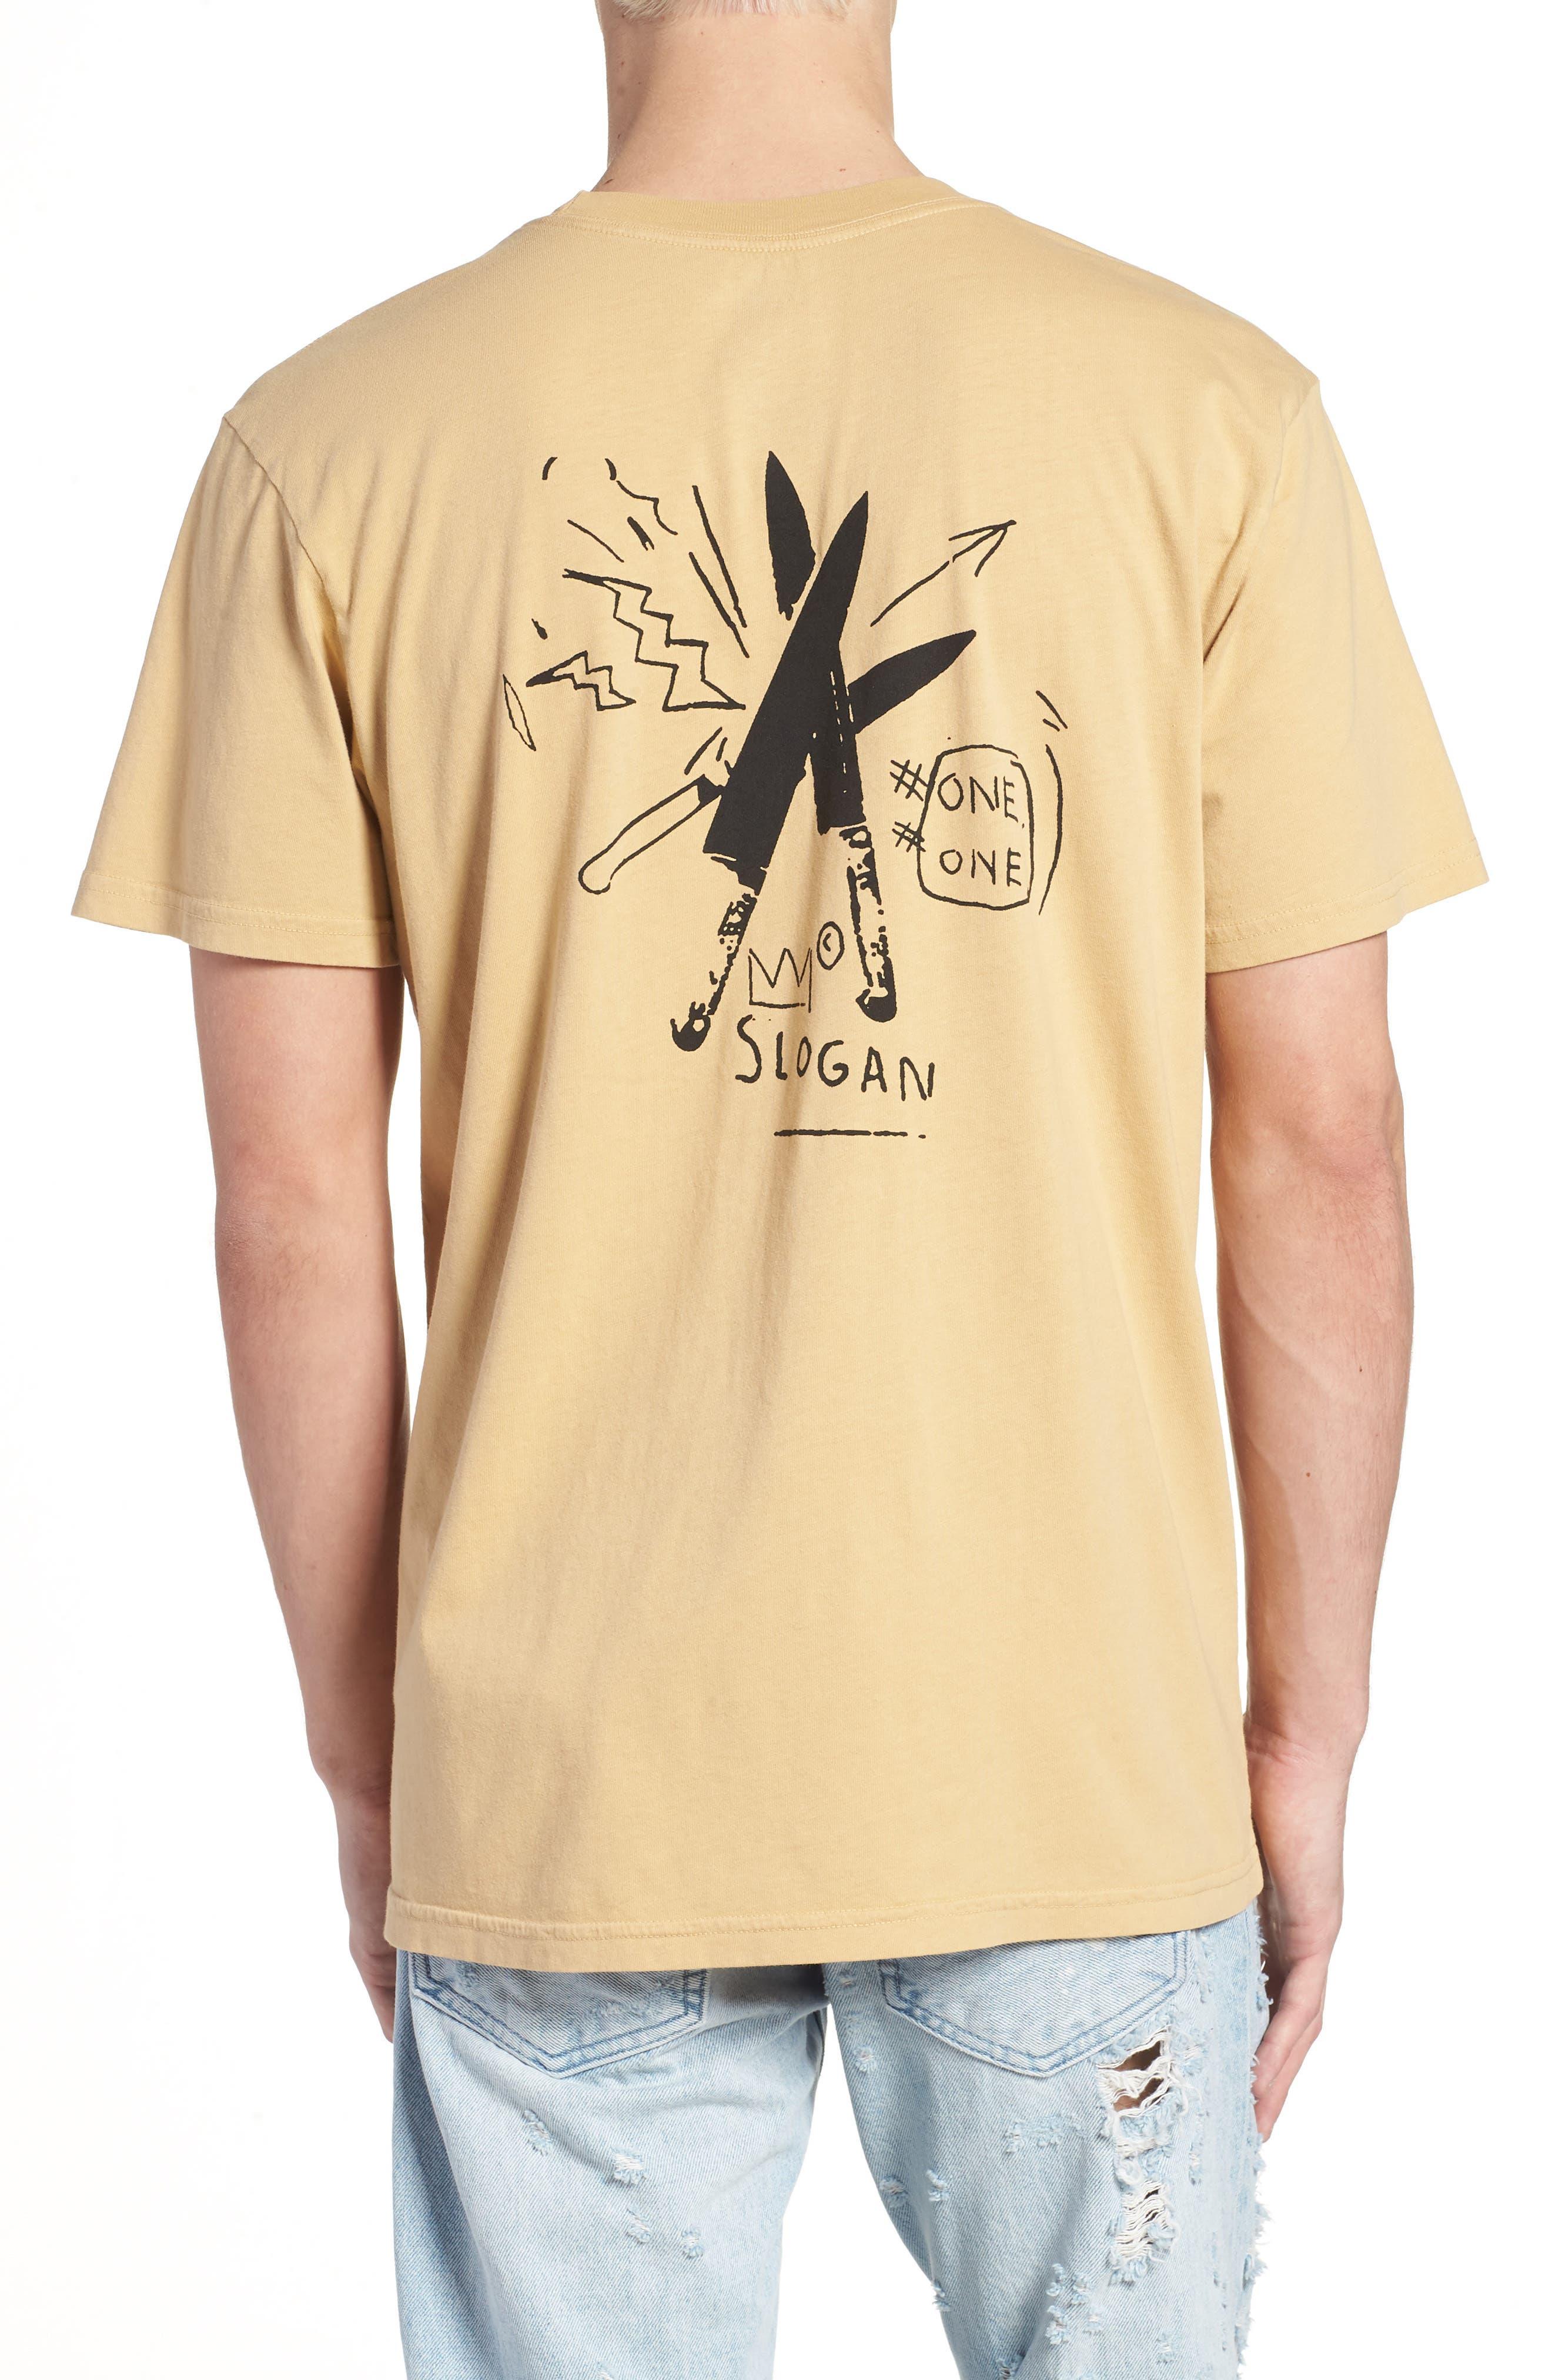 x Warhol Slogan T-Shirt,                             Alternate thumbnail 2, color,                             250